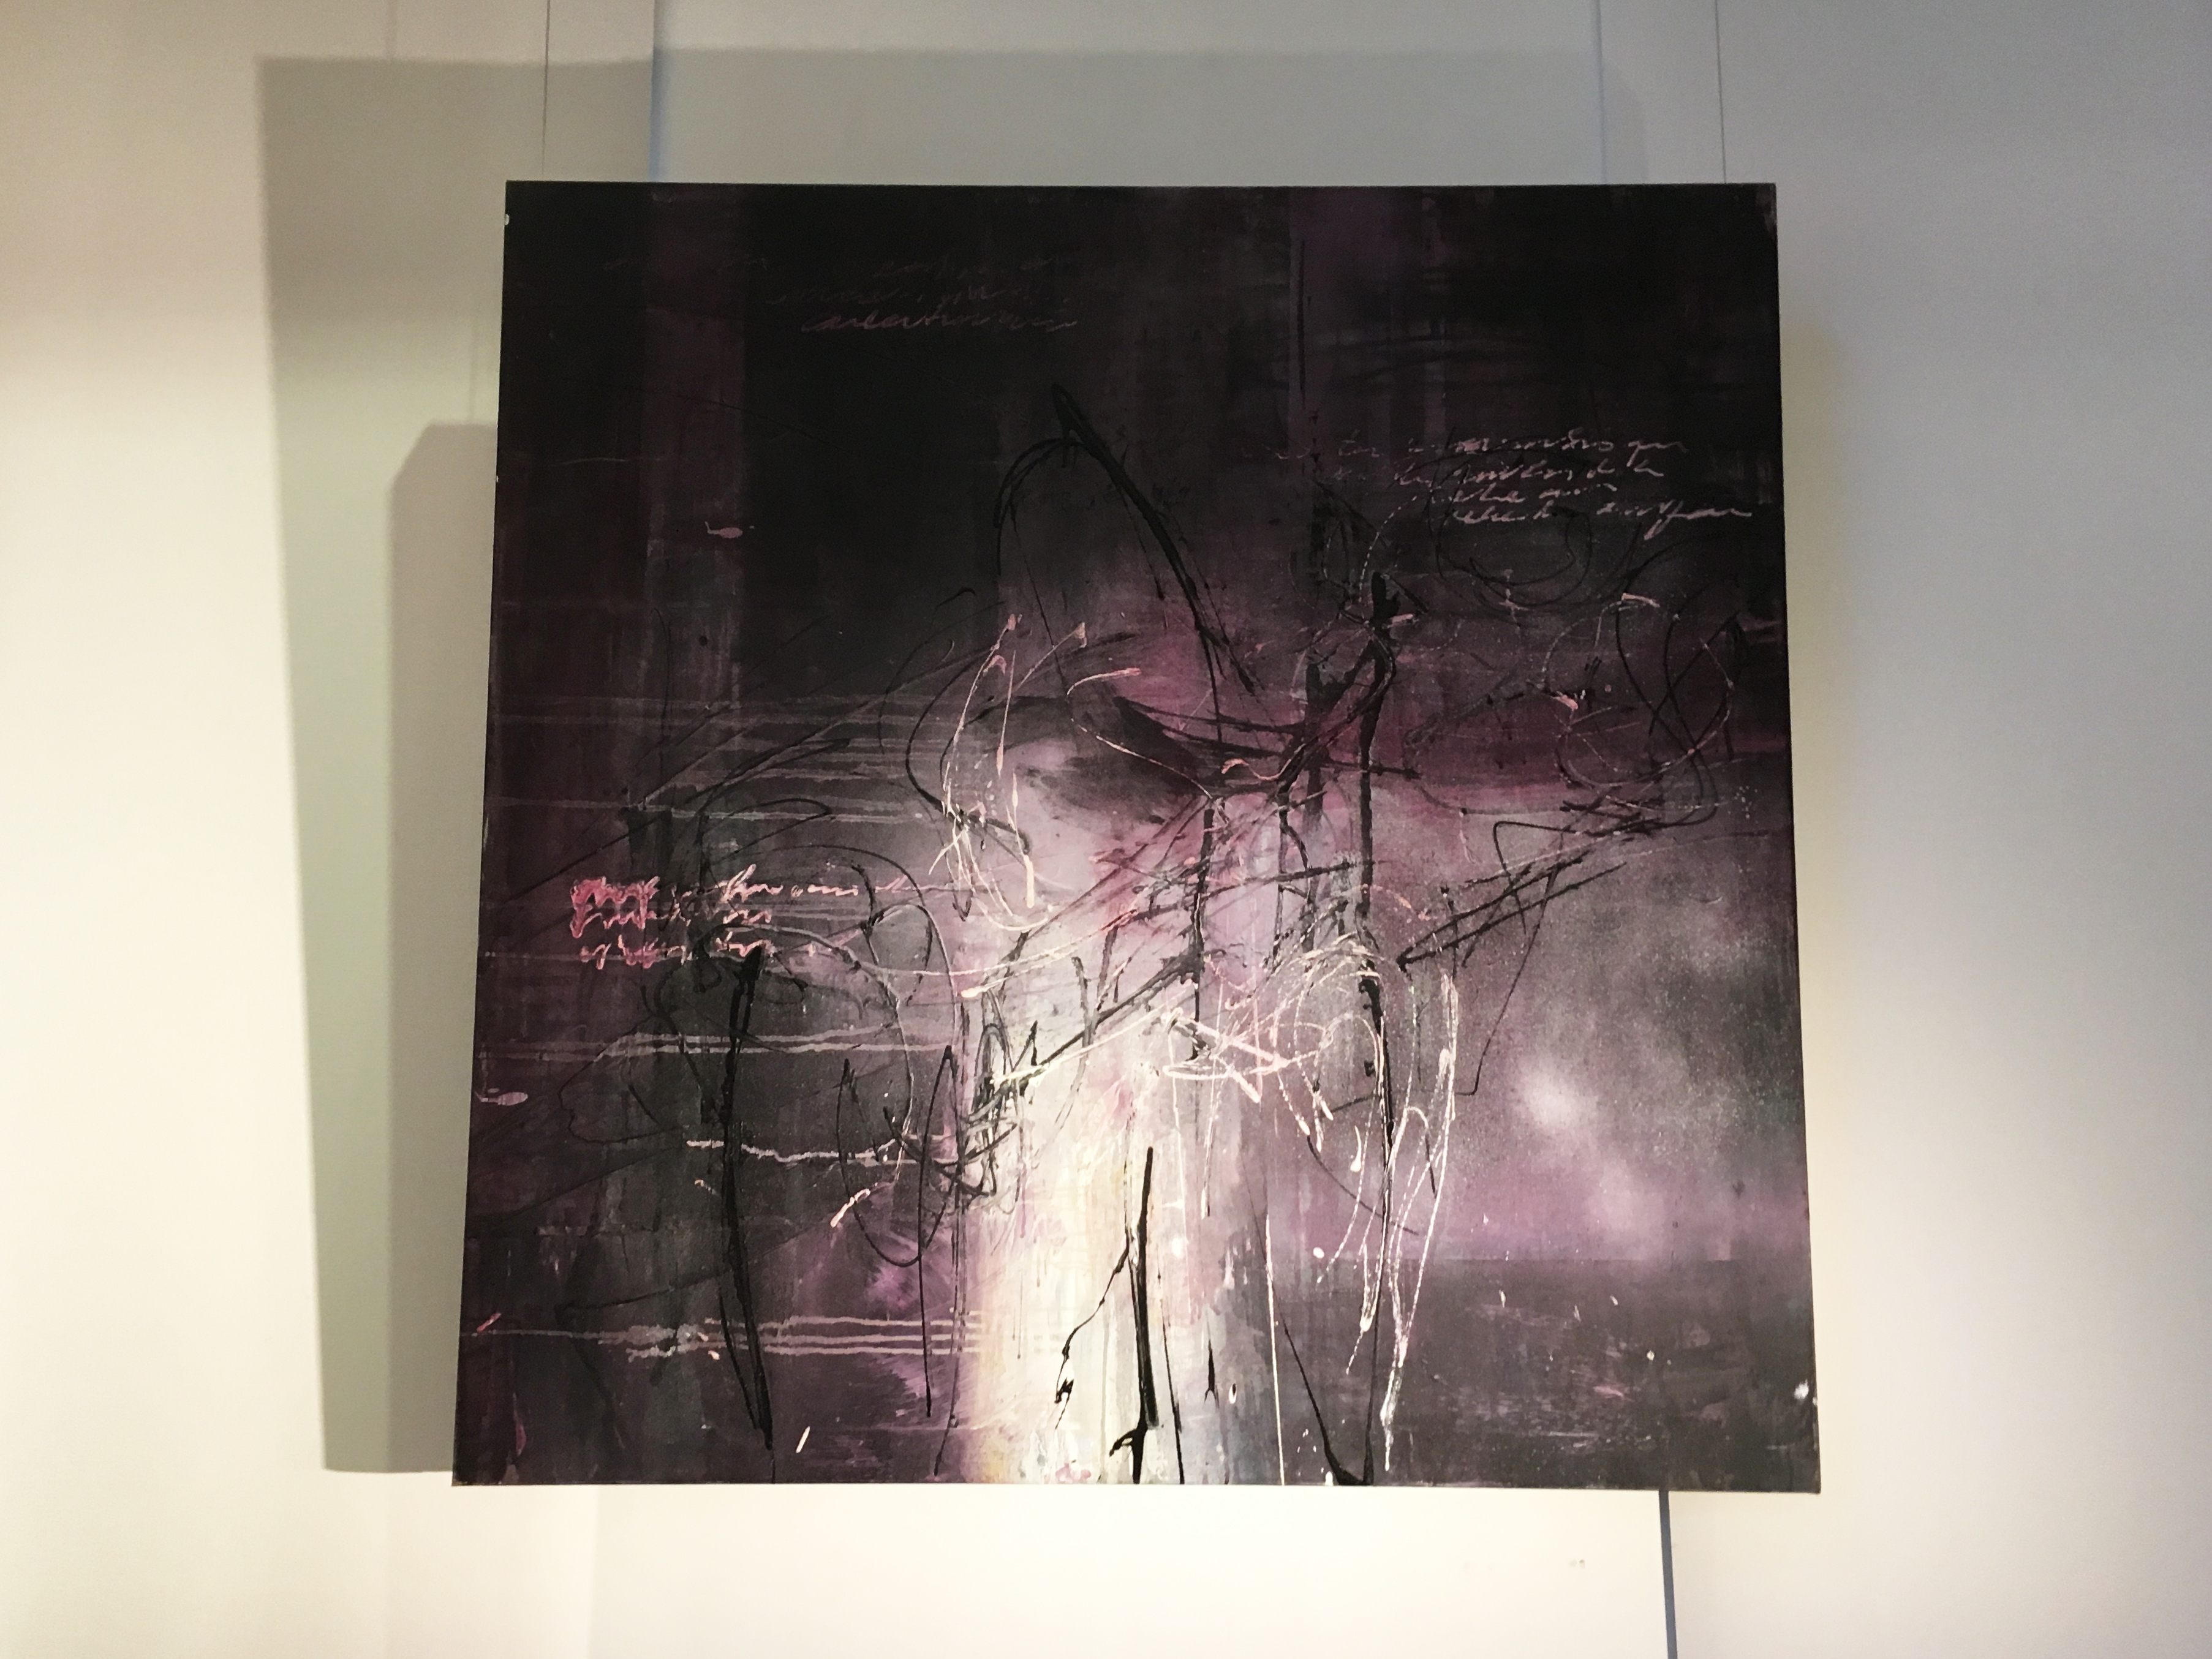 Víctor Ramírez,《Inspriracion》,130x130 cm,Acrylic on Canvas,2017。